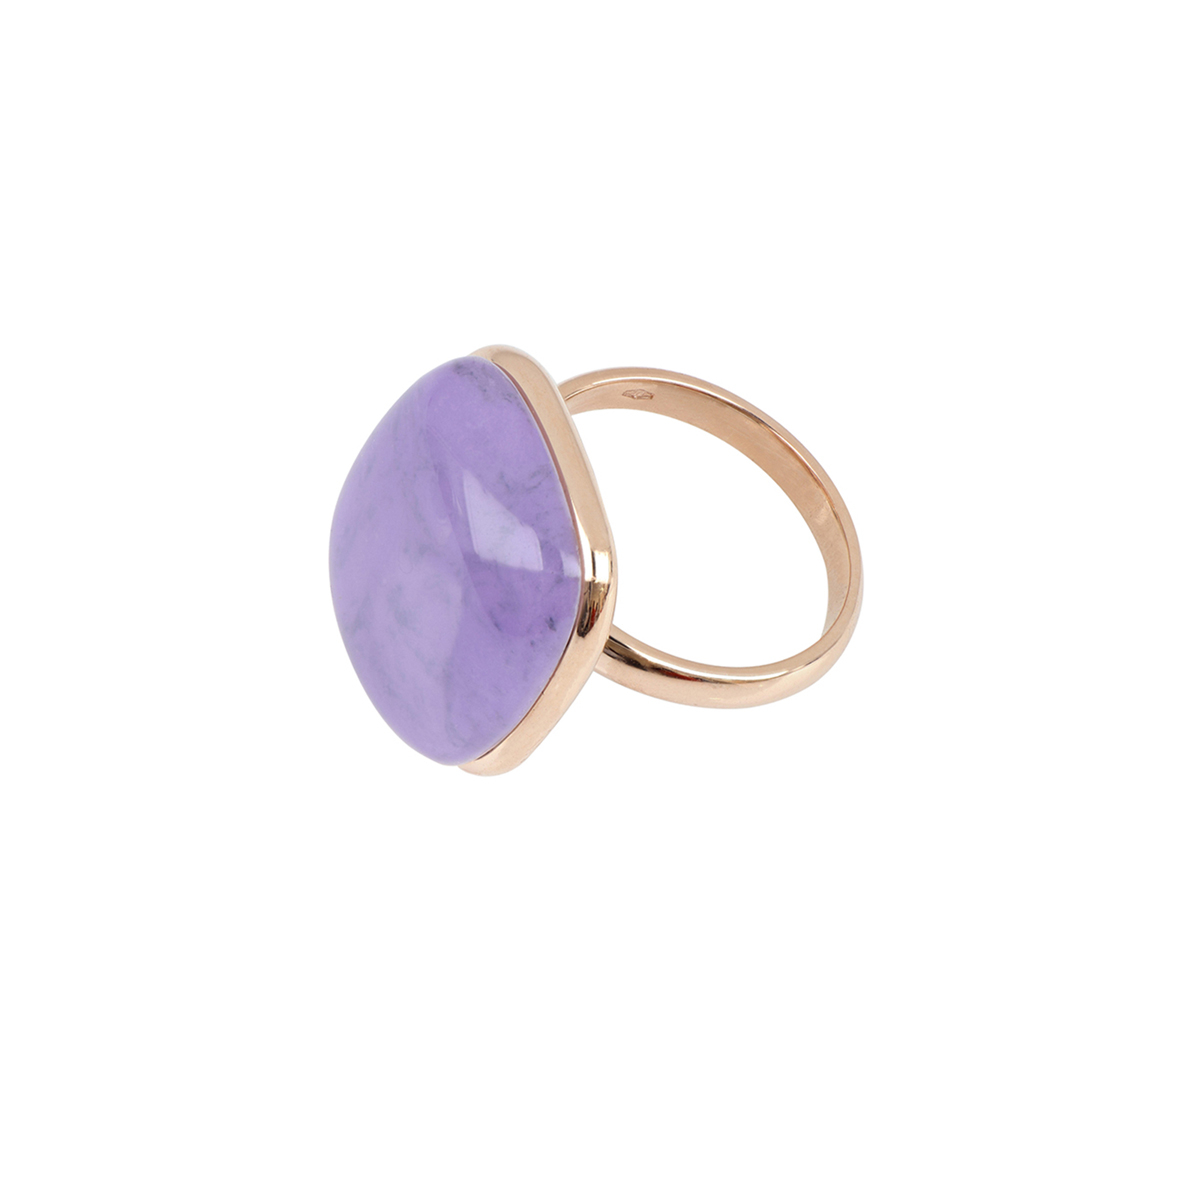 Cabochon Cut Quartz And Sugilite Stone Ring